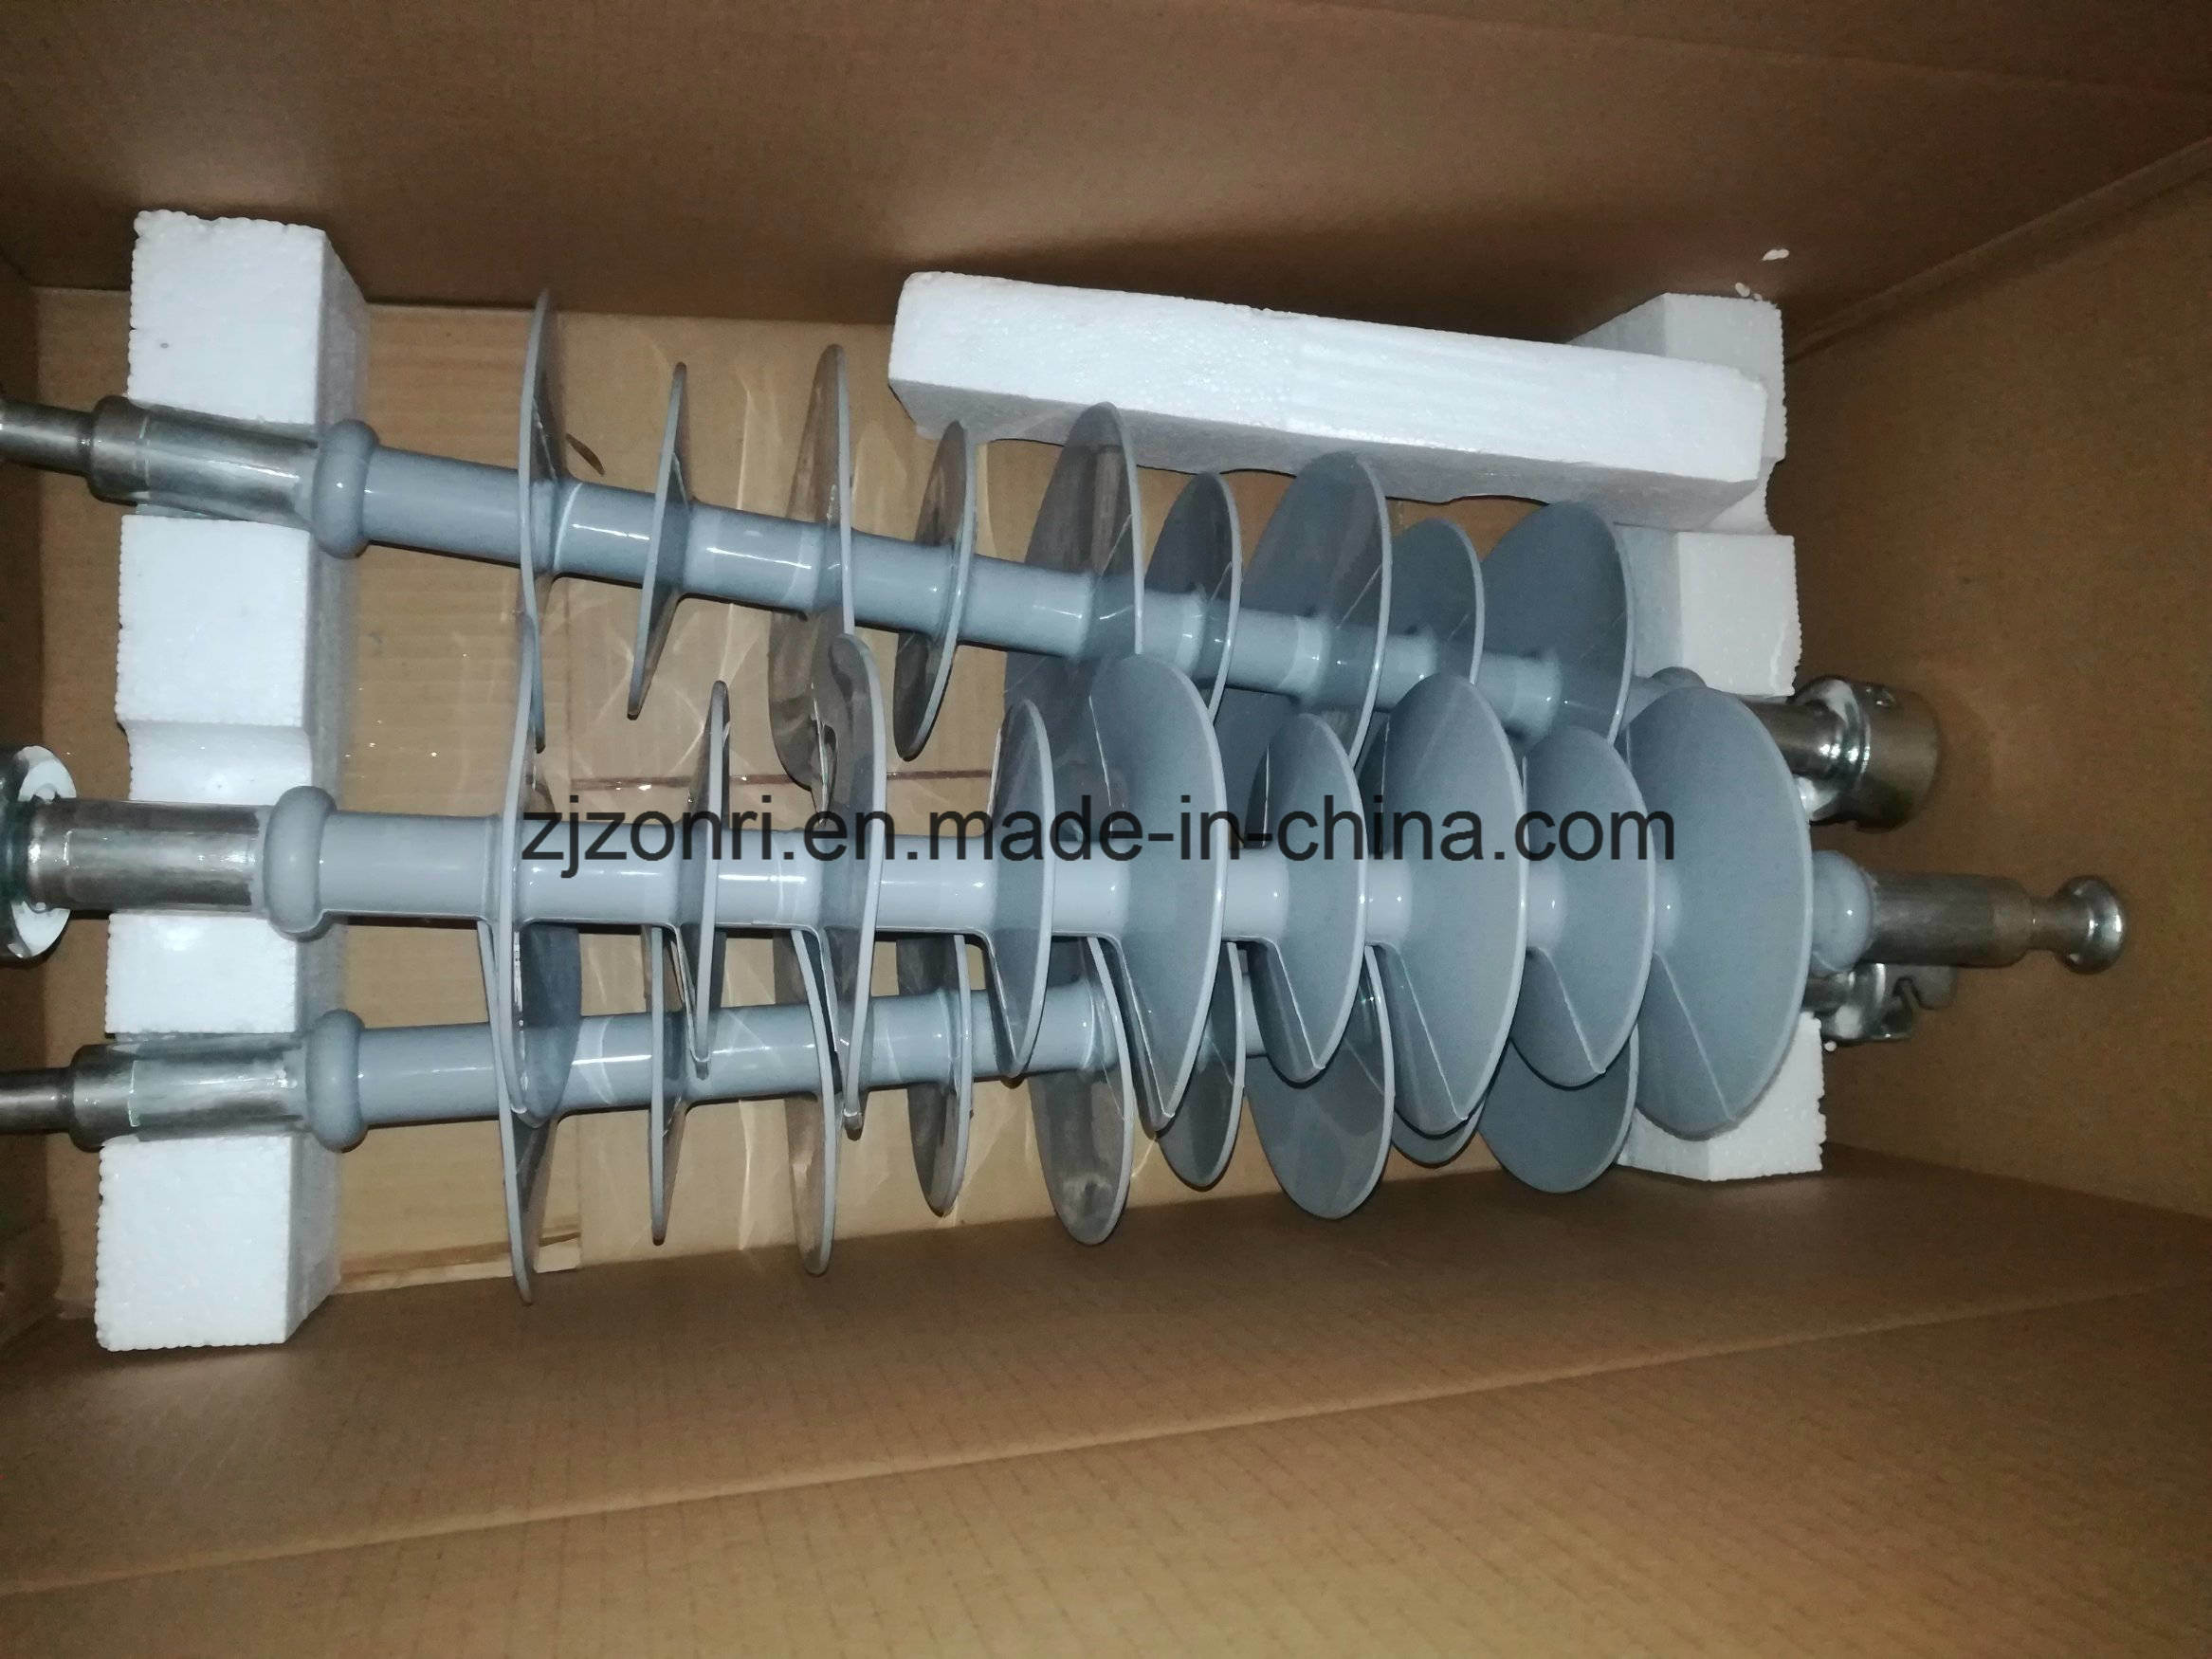 Composite Insulator/ Suspension Insulator (Fxbw-24/70, Fxbw-24/120